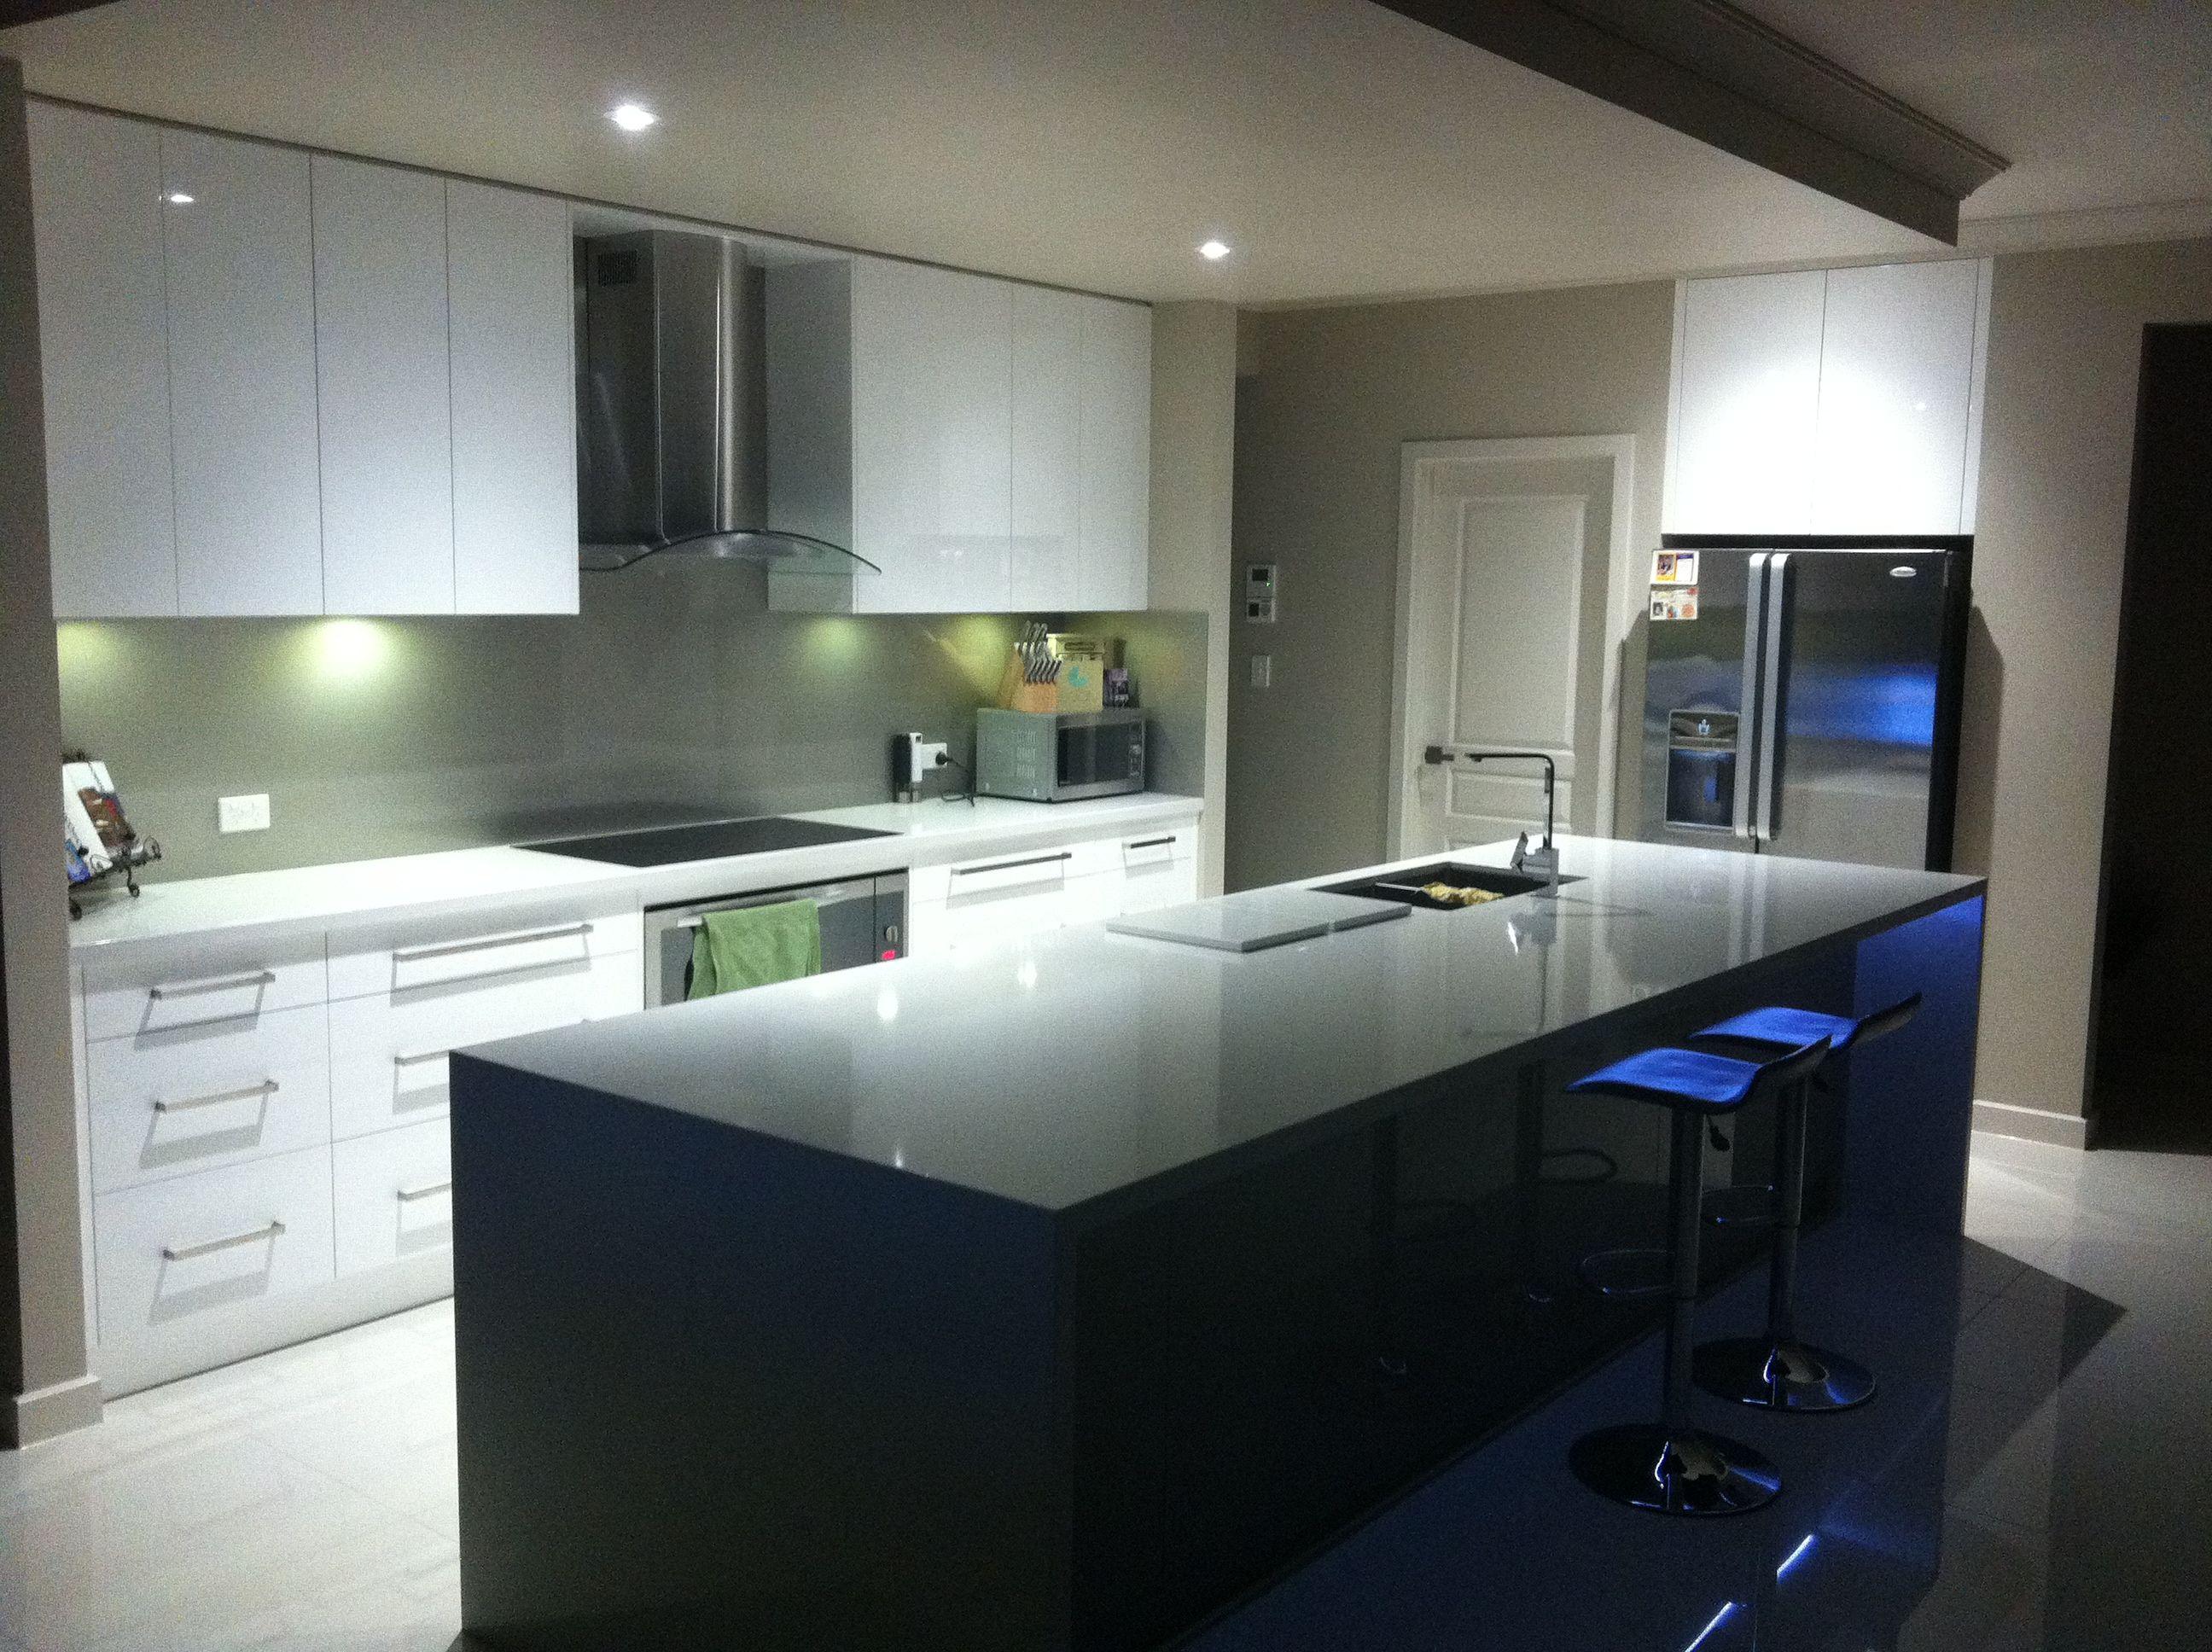 Kitchen: Tops- Essastone 'new crystal salt' 40mm with slab ...